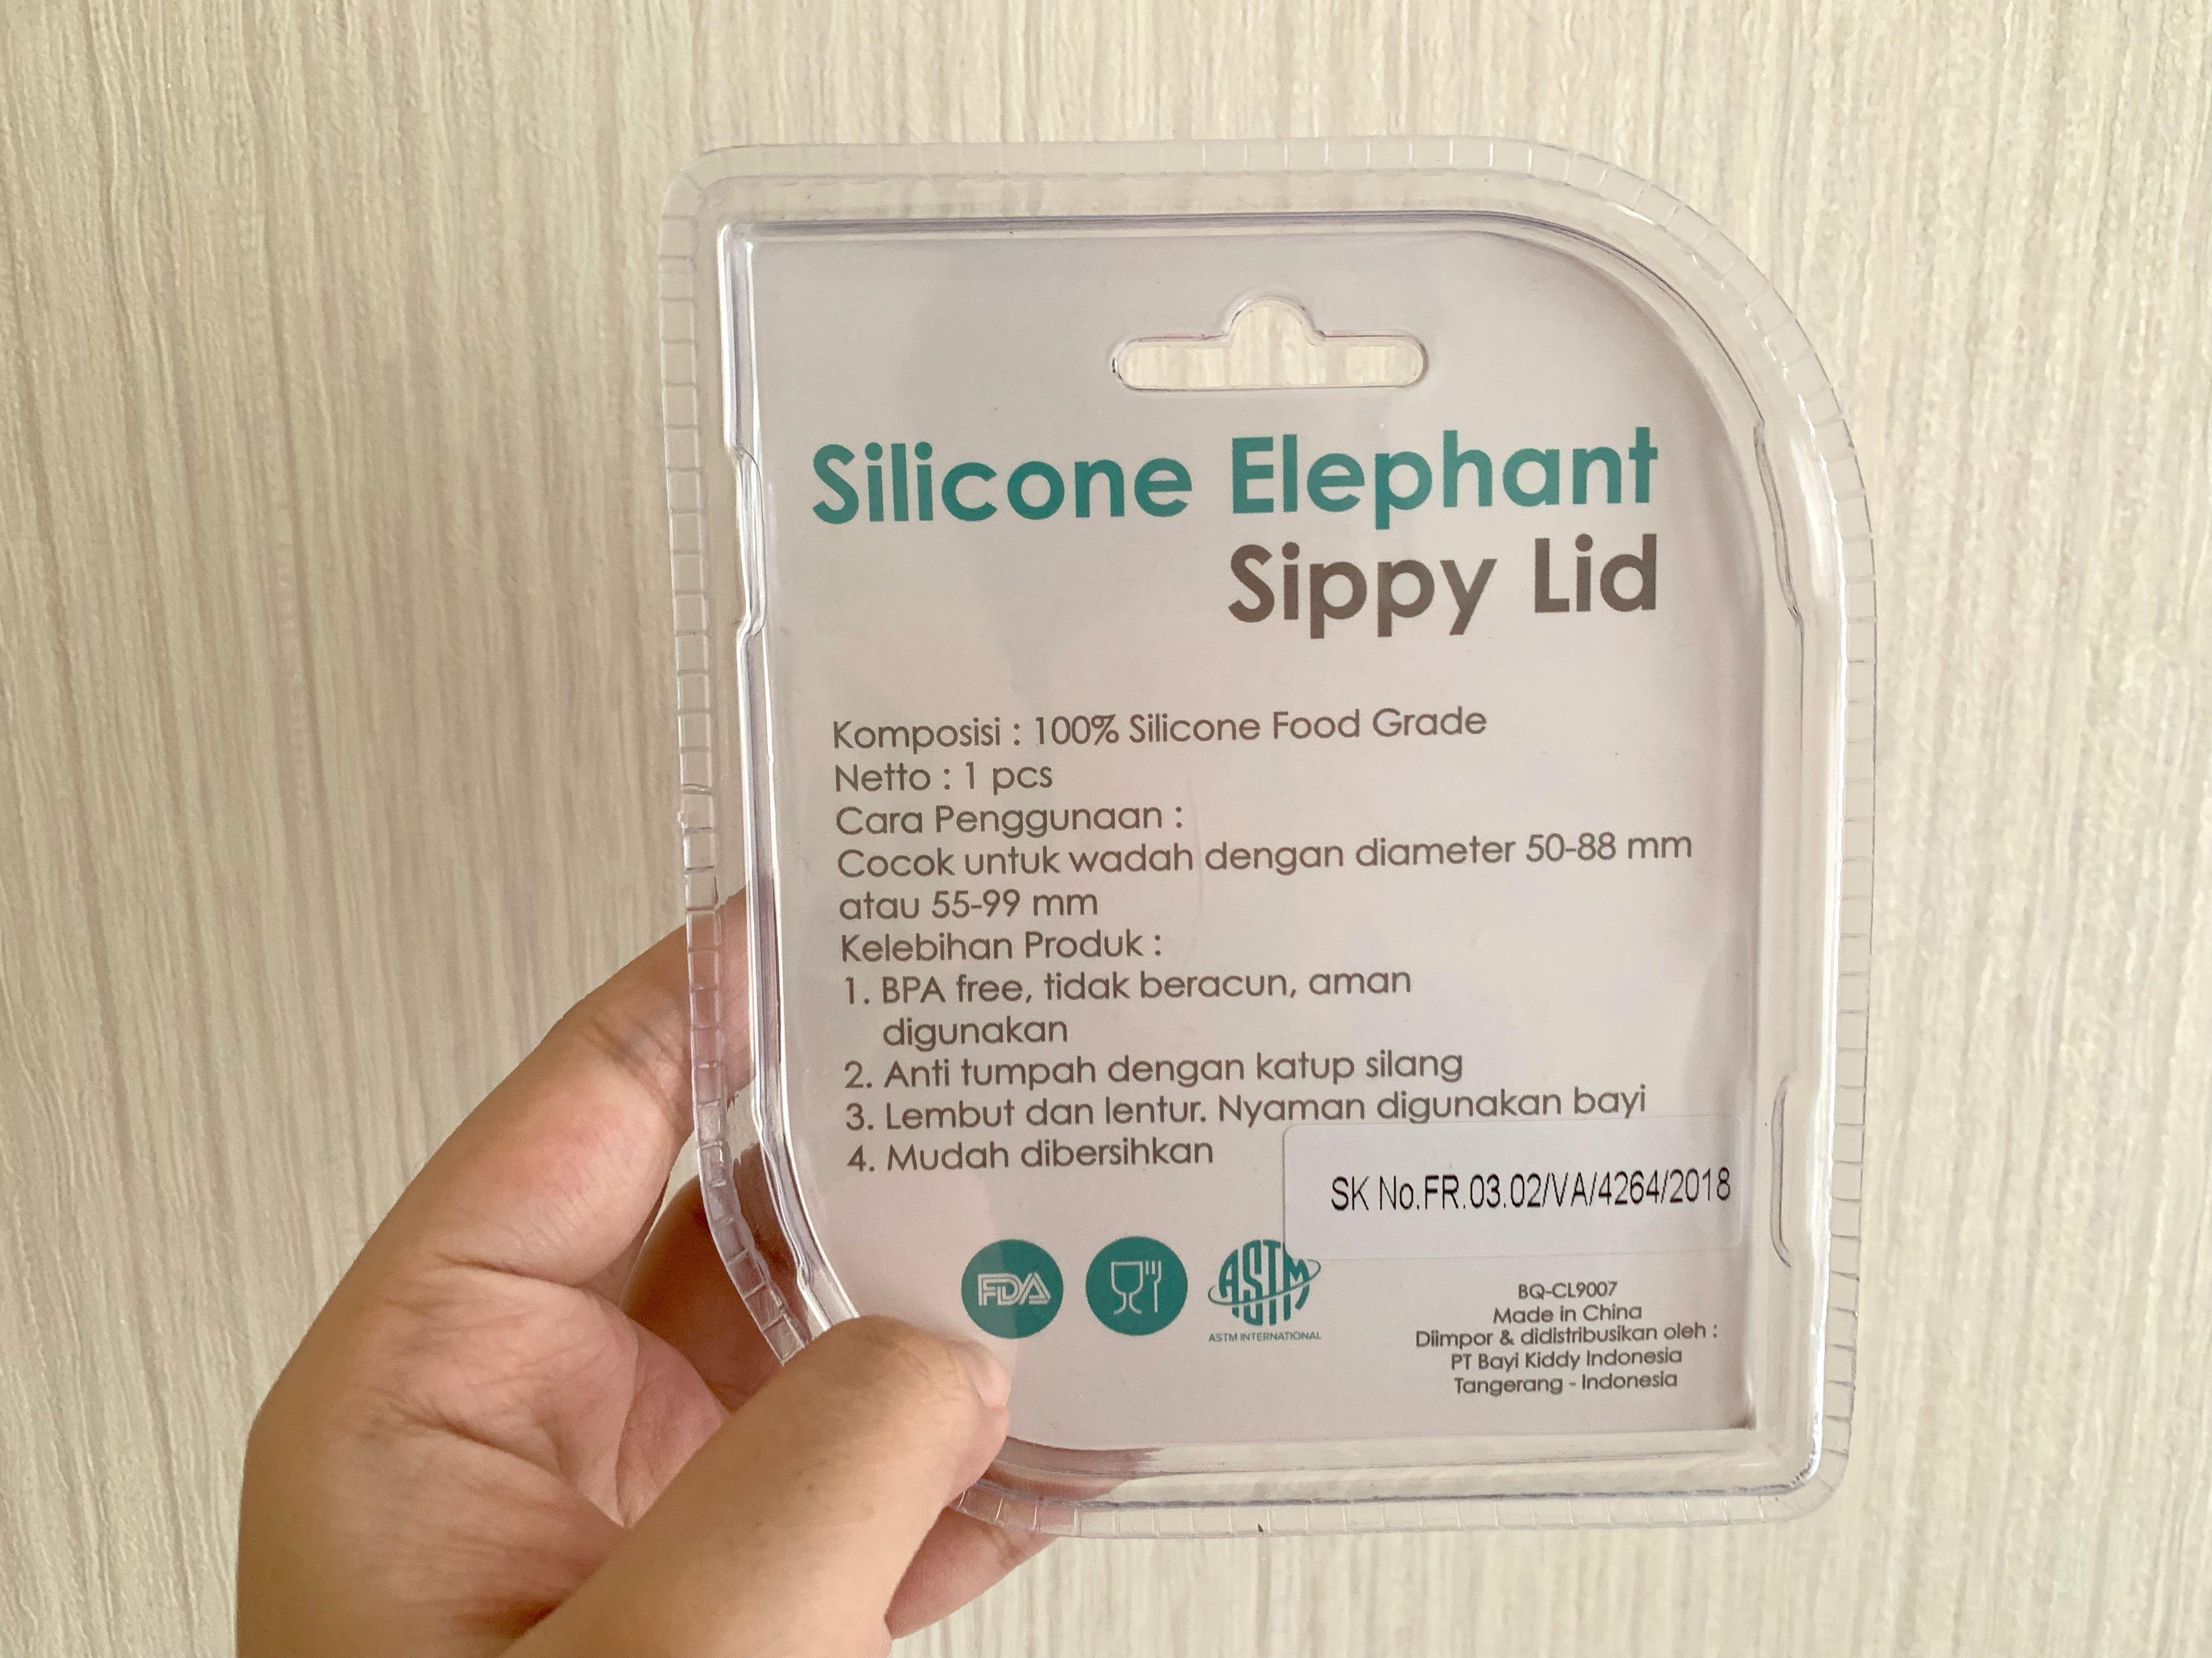 BABYQLO Silicone Elephant Sippy Lid